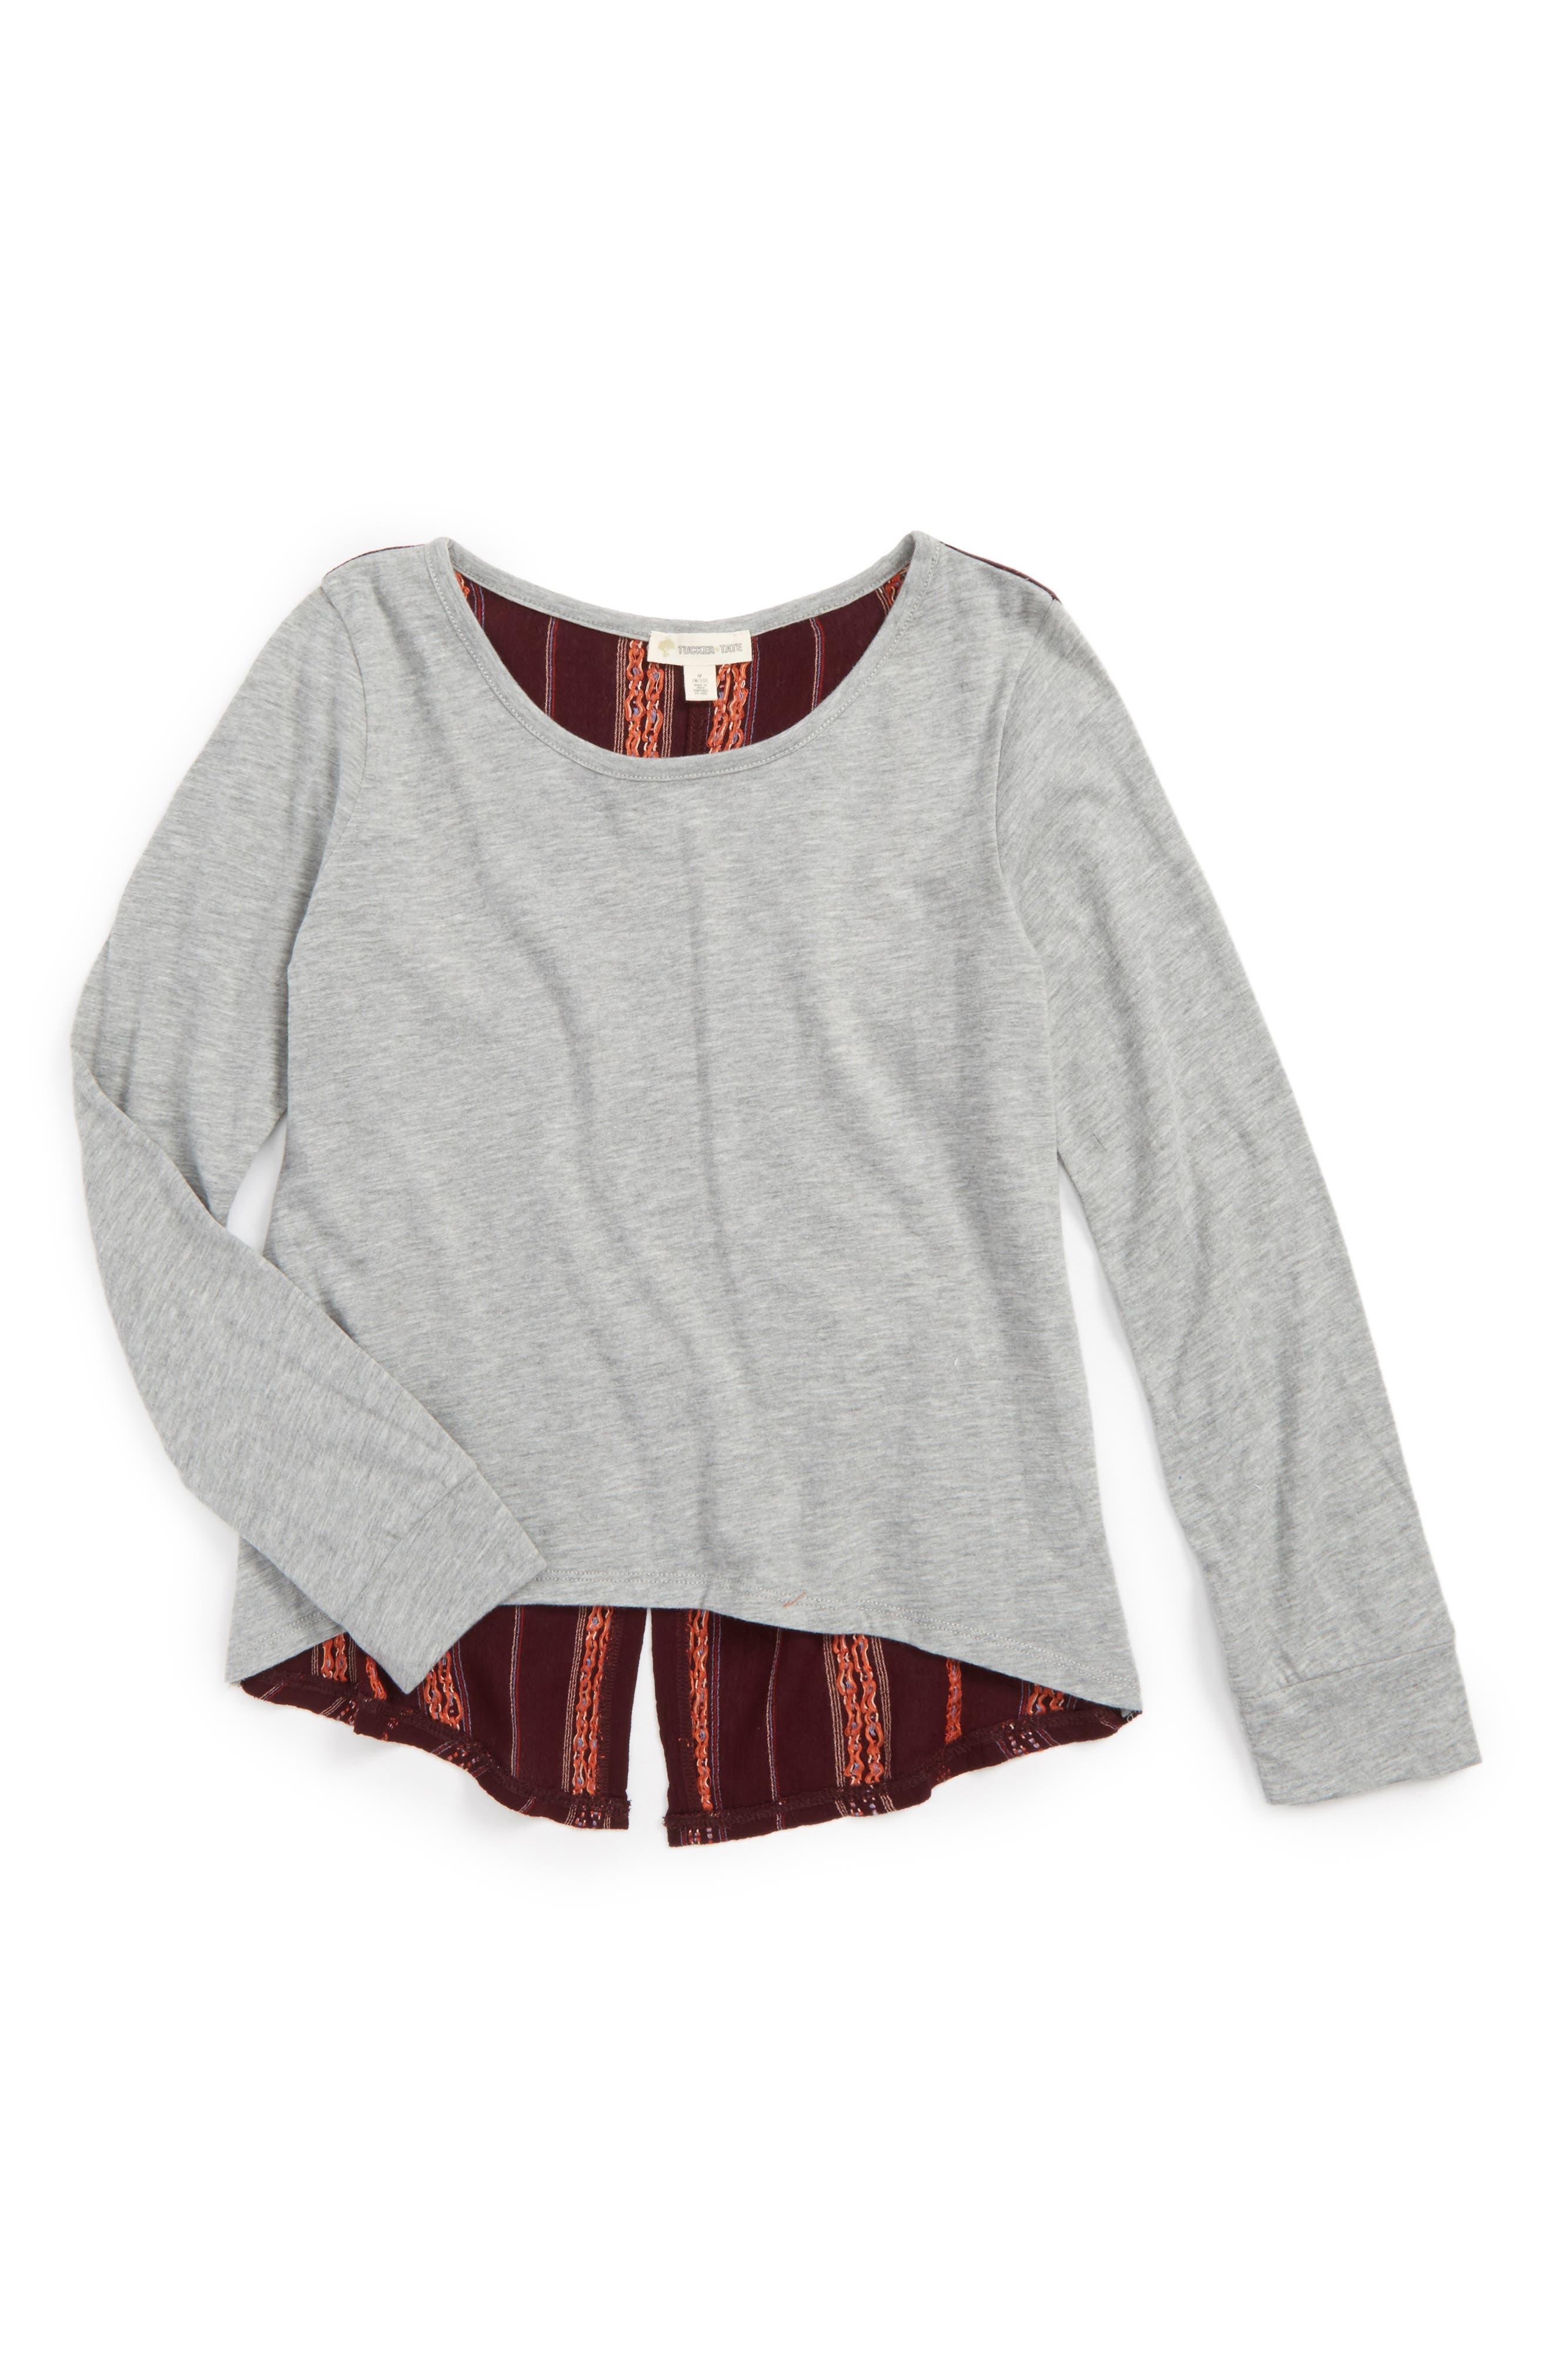 Embroidered Back Shirt,                         Main,                         color, Grey Medium Heather